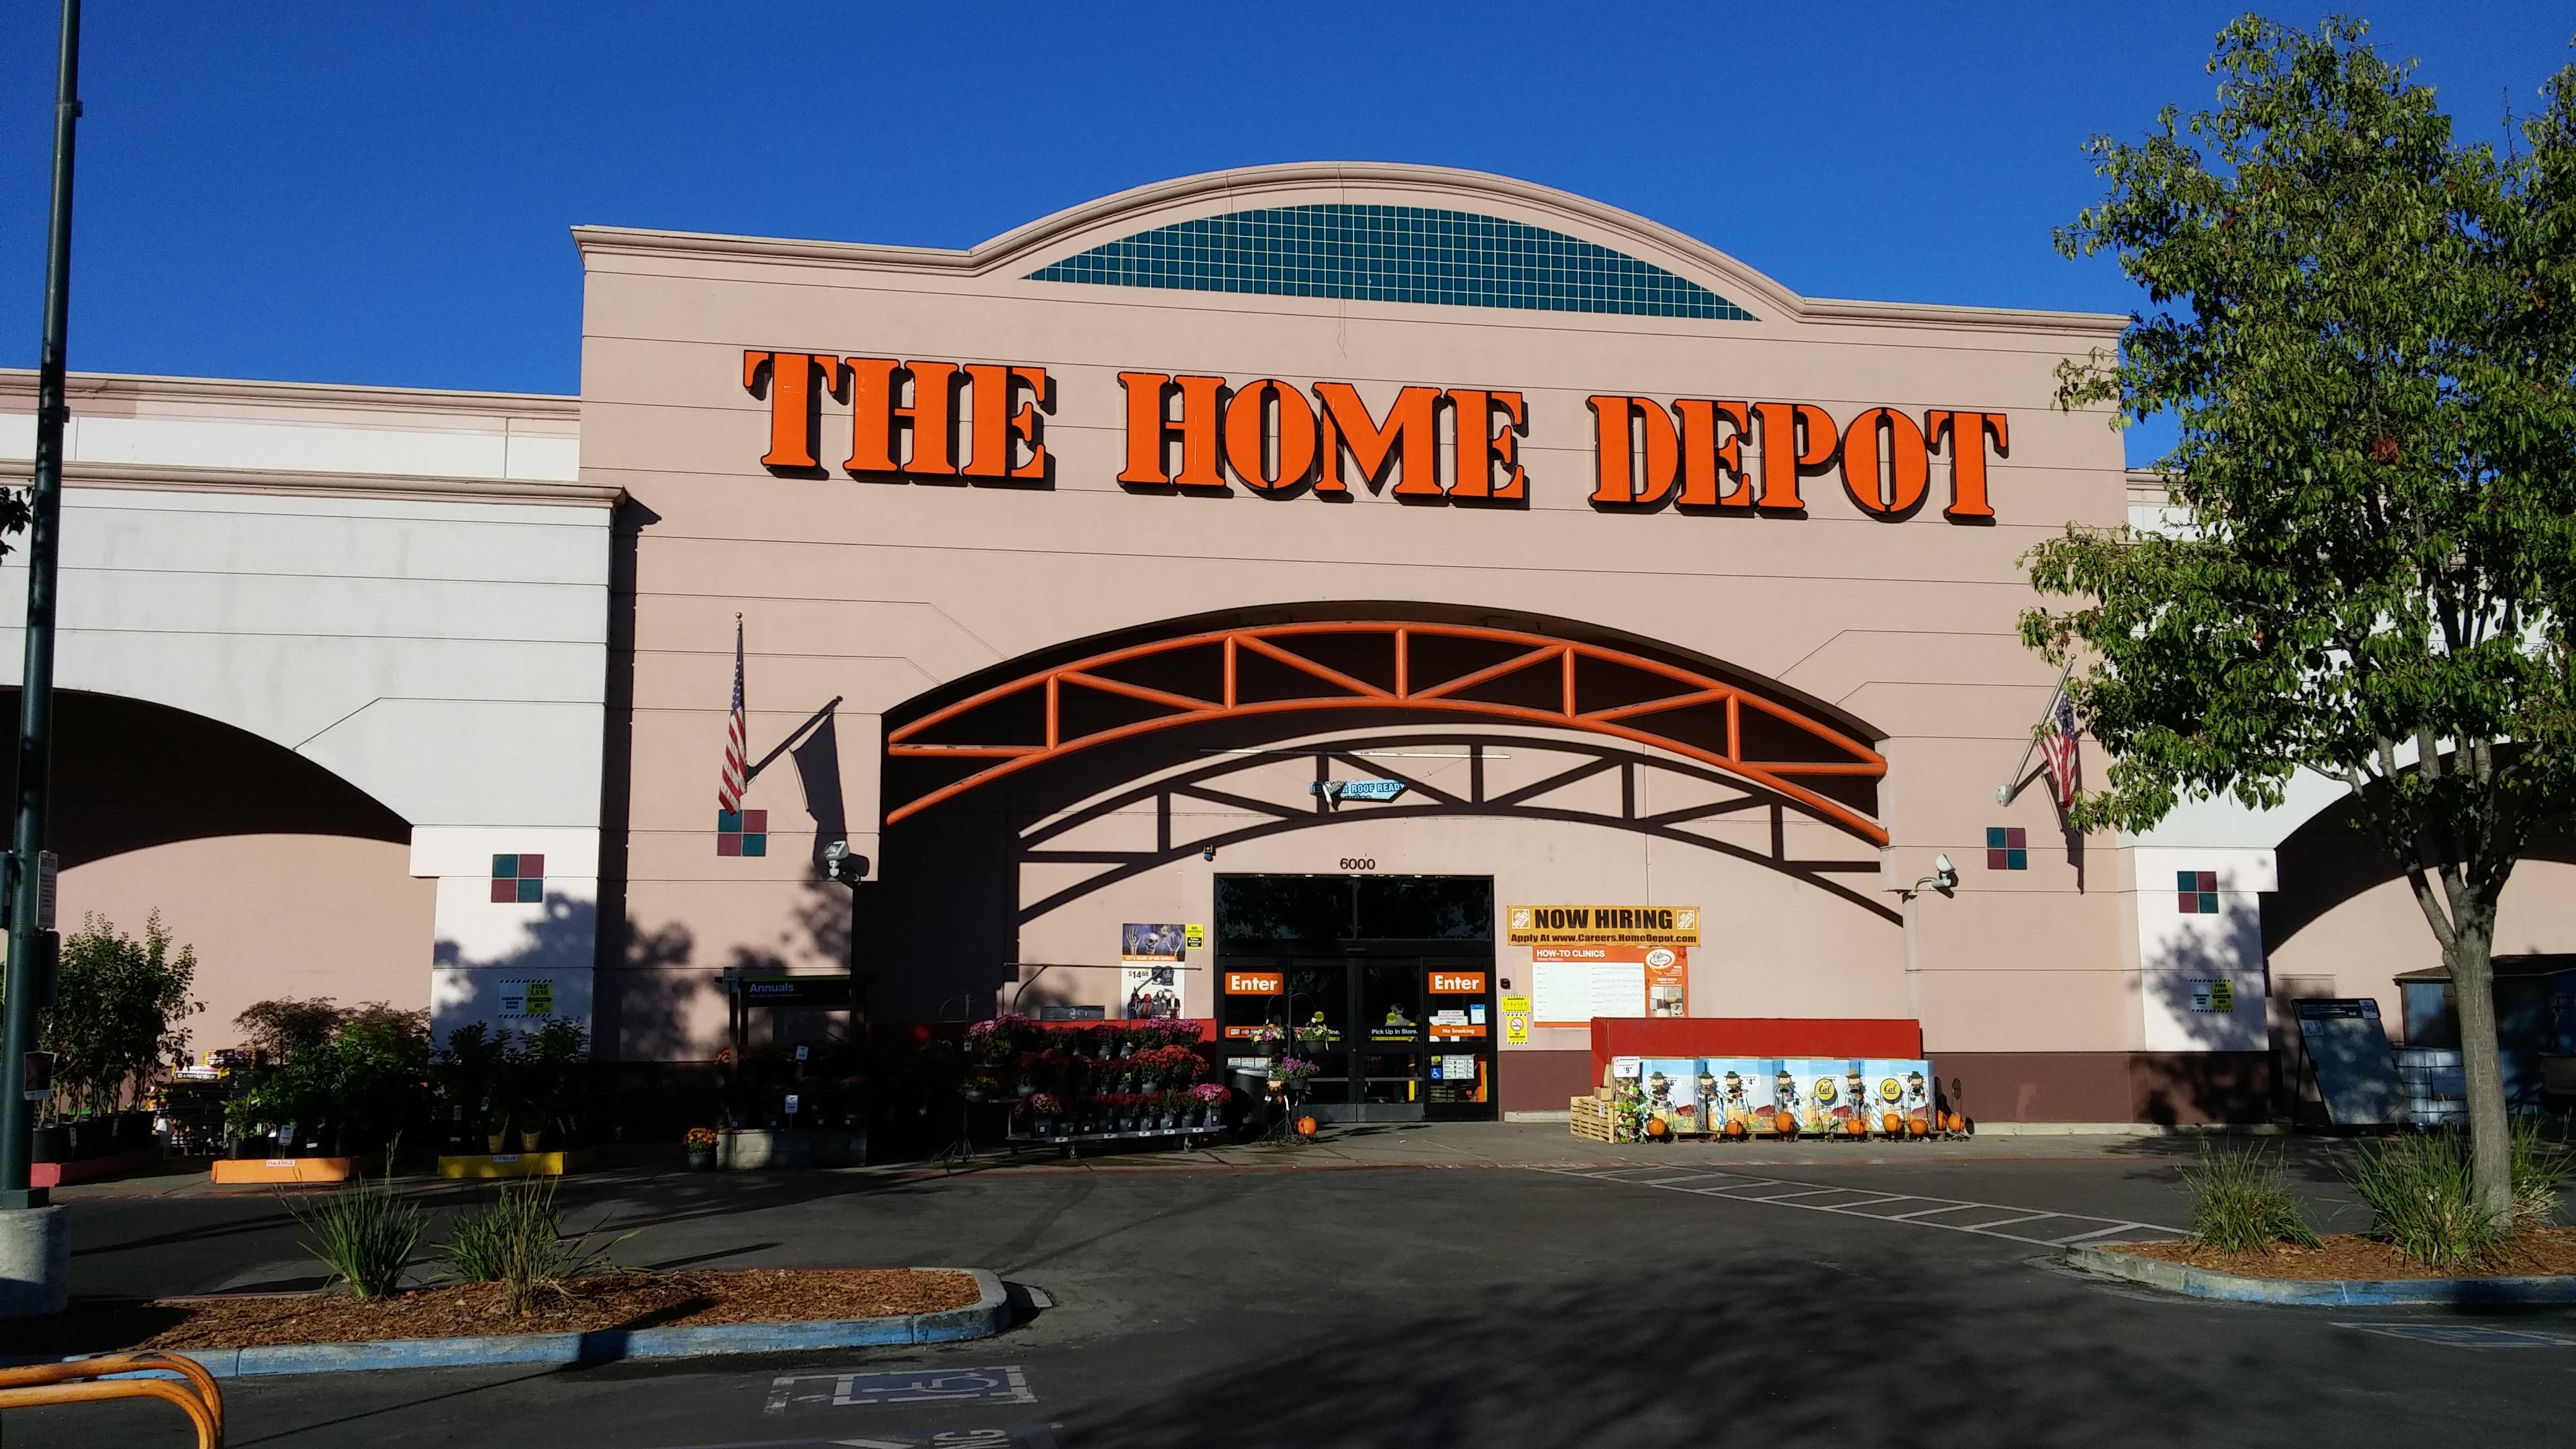 The Home Depot 6000 Johnson Dr Pleasanton, CA Hardware